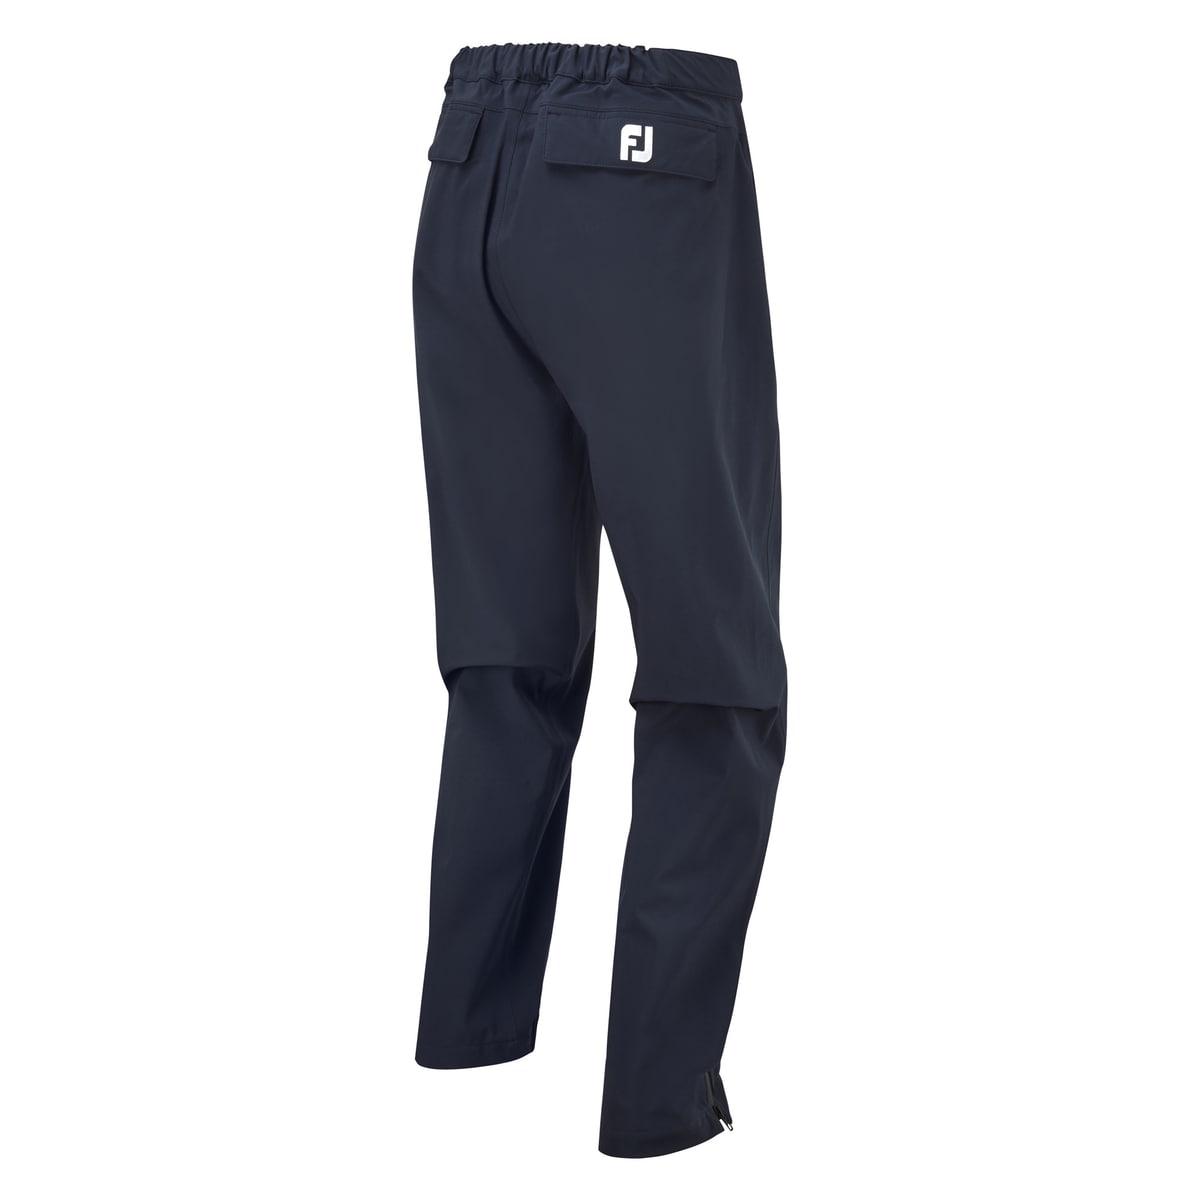 DryJoys Tour LTS Rain Trousers